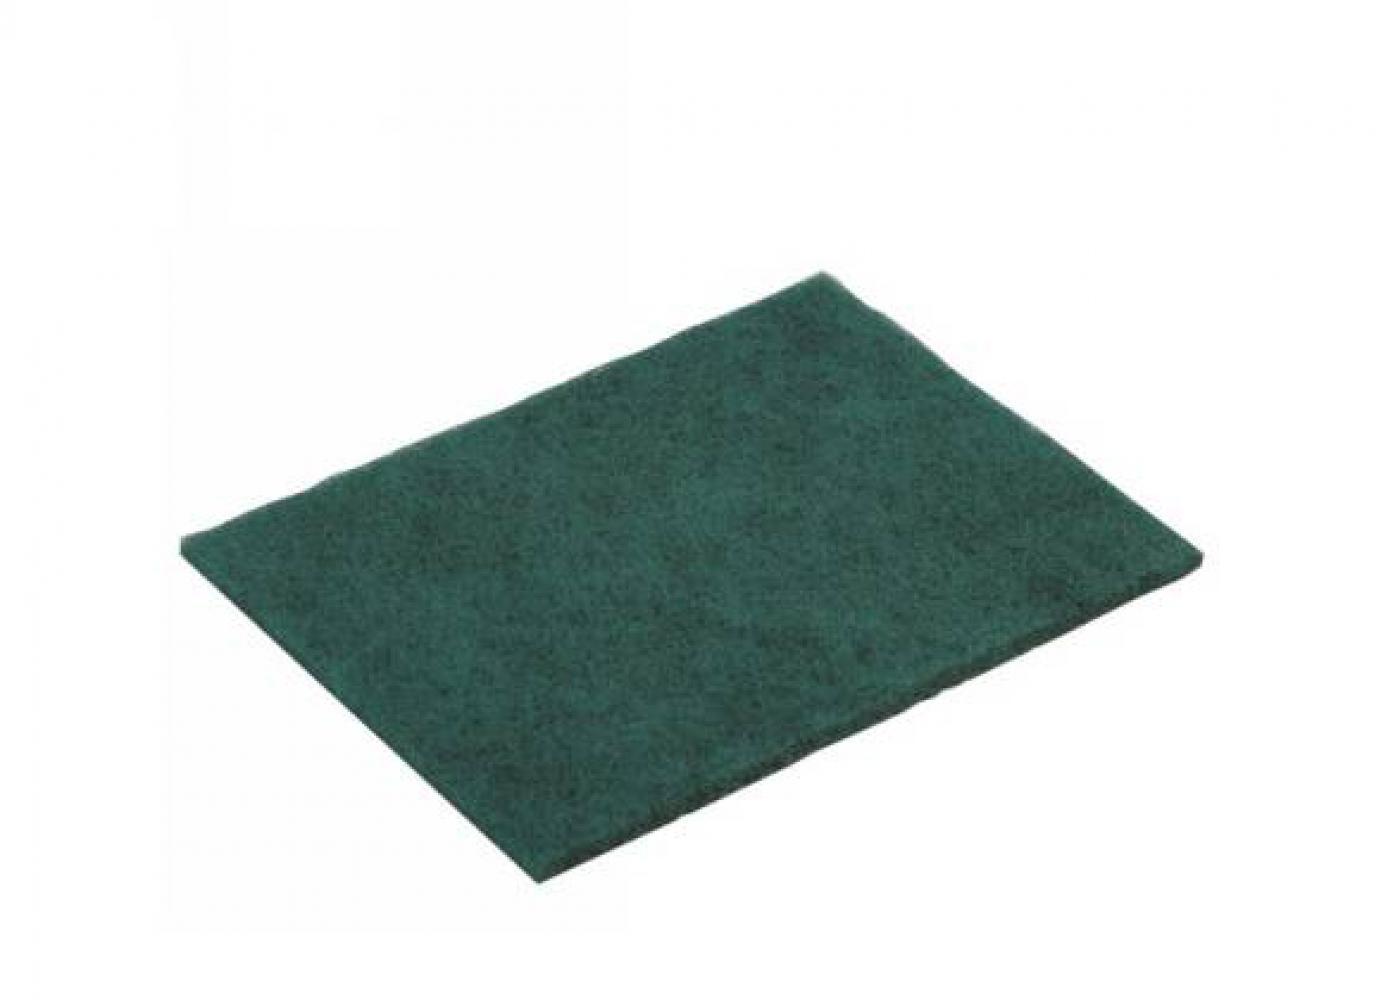 Acquista 10 Pezzi Fibraverde Handpad 17545589 | Glooke.com